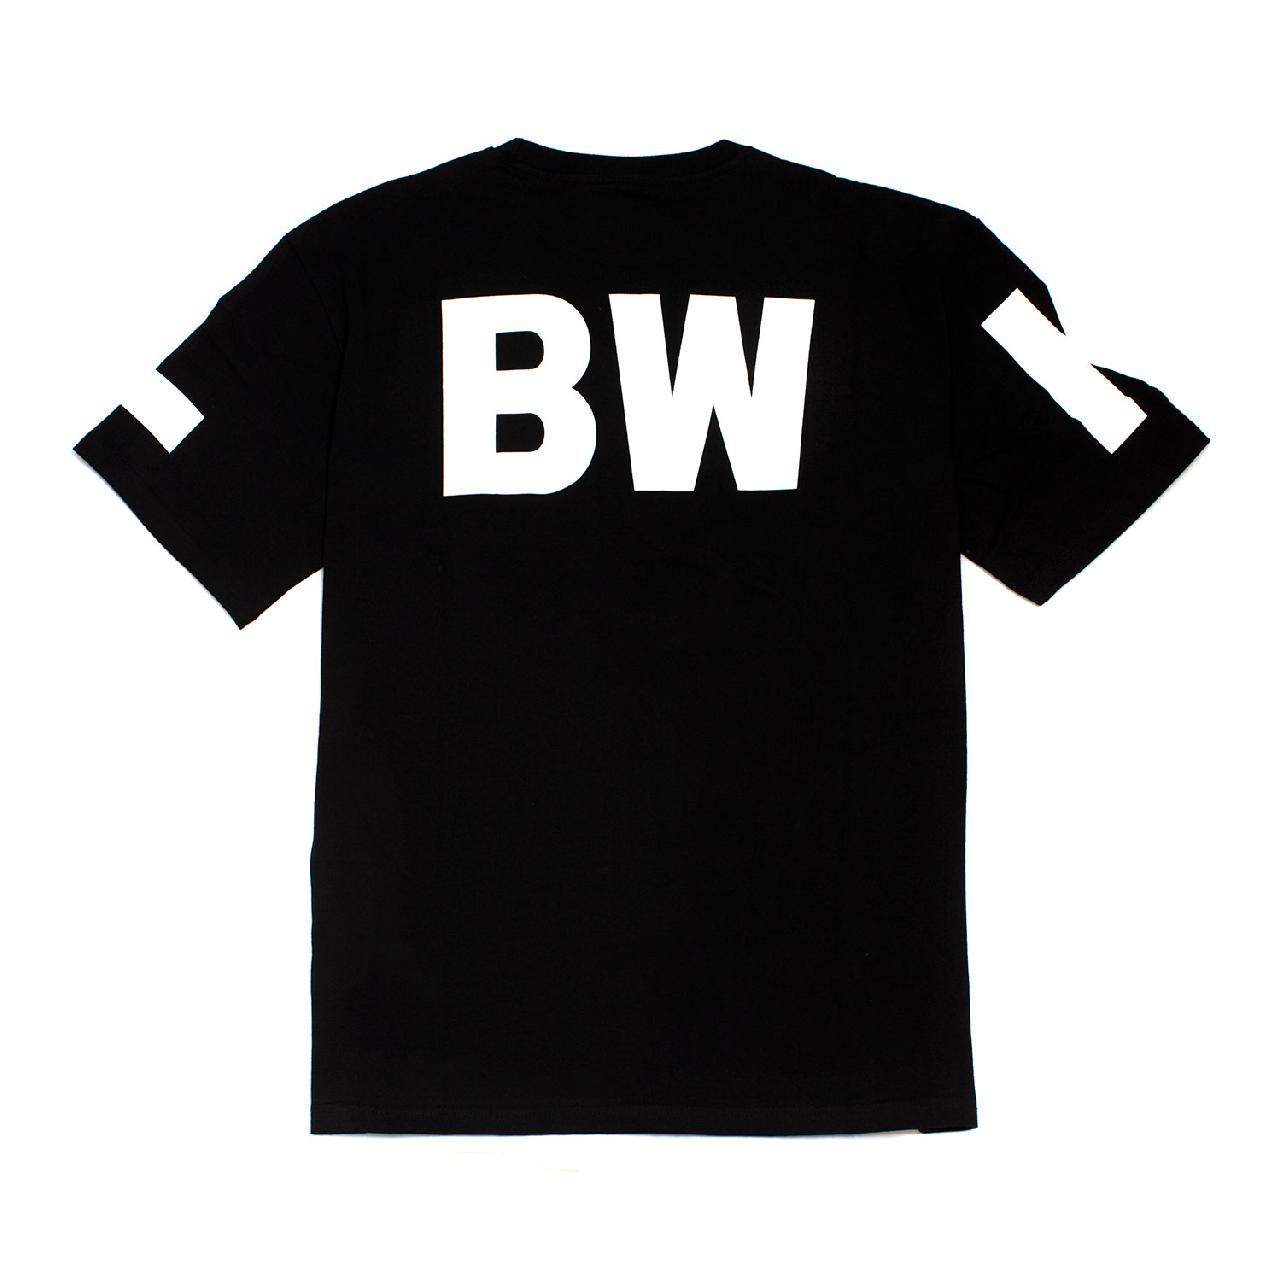 LBWK ロゴ ビッグTee Black